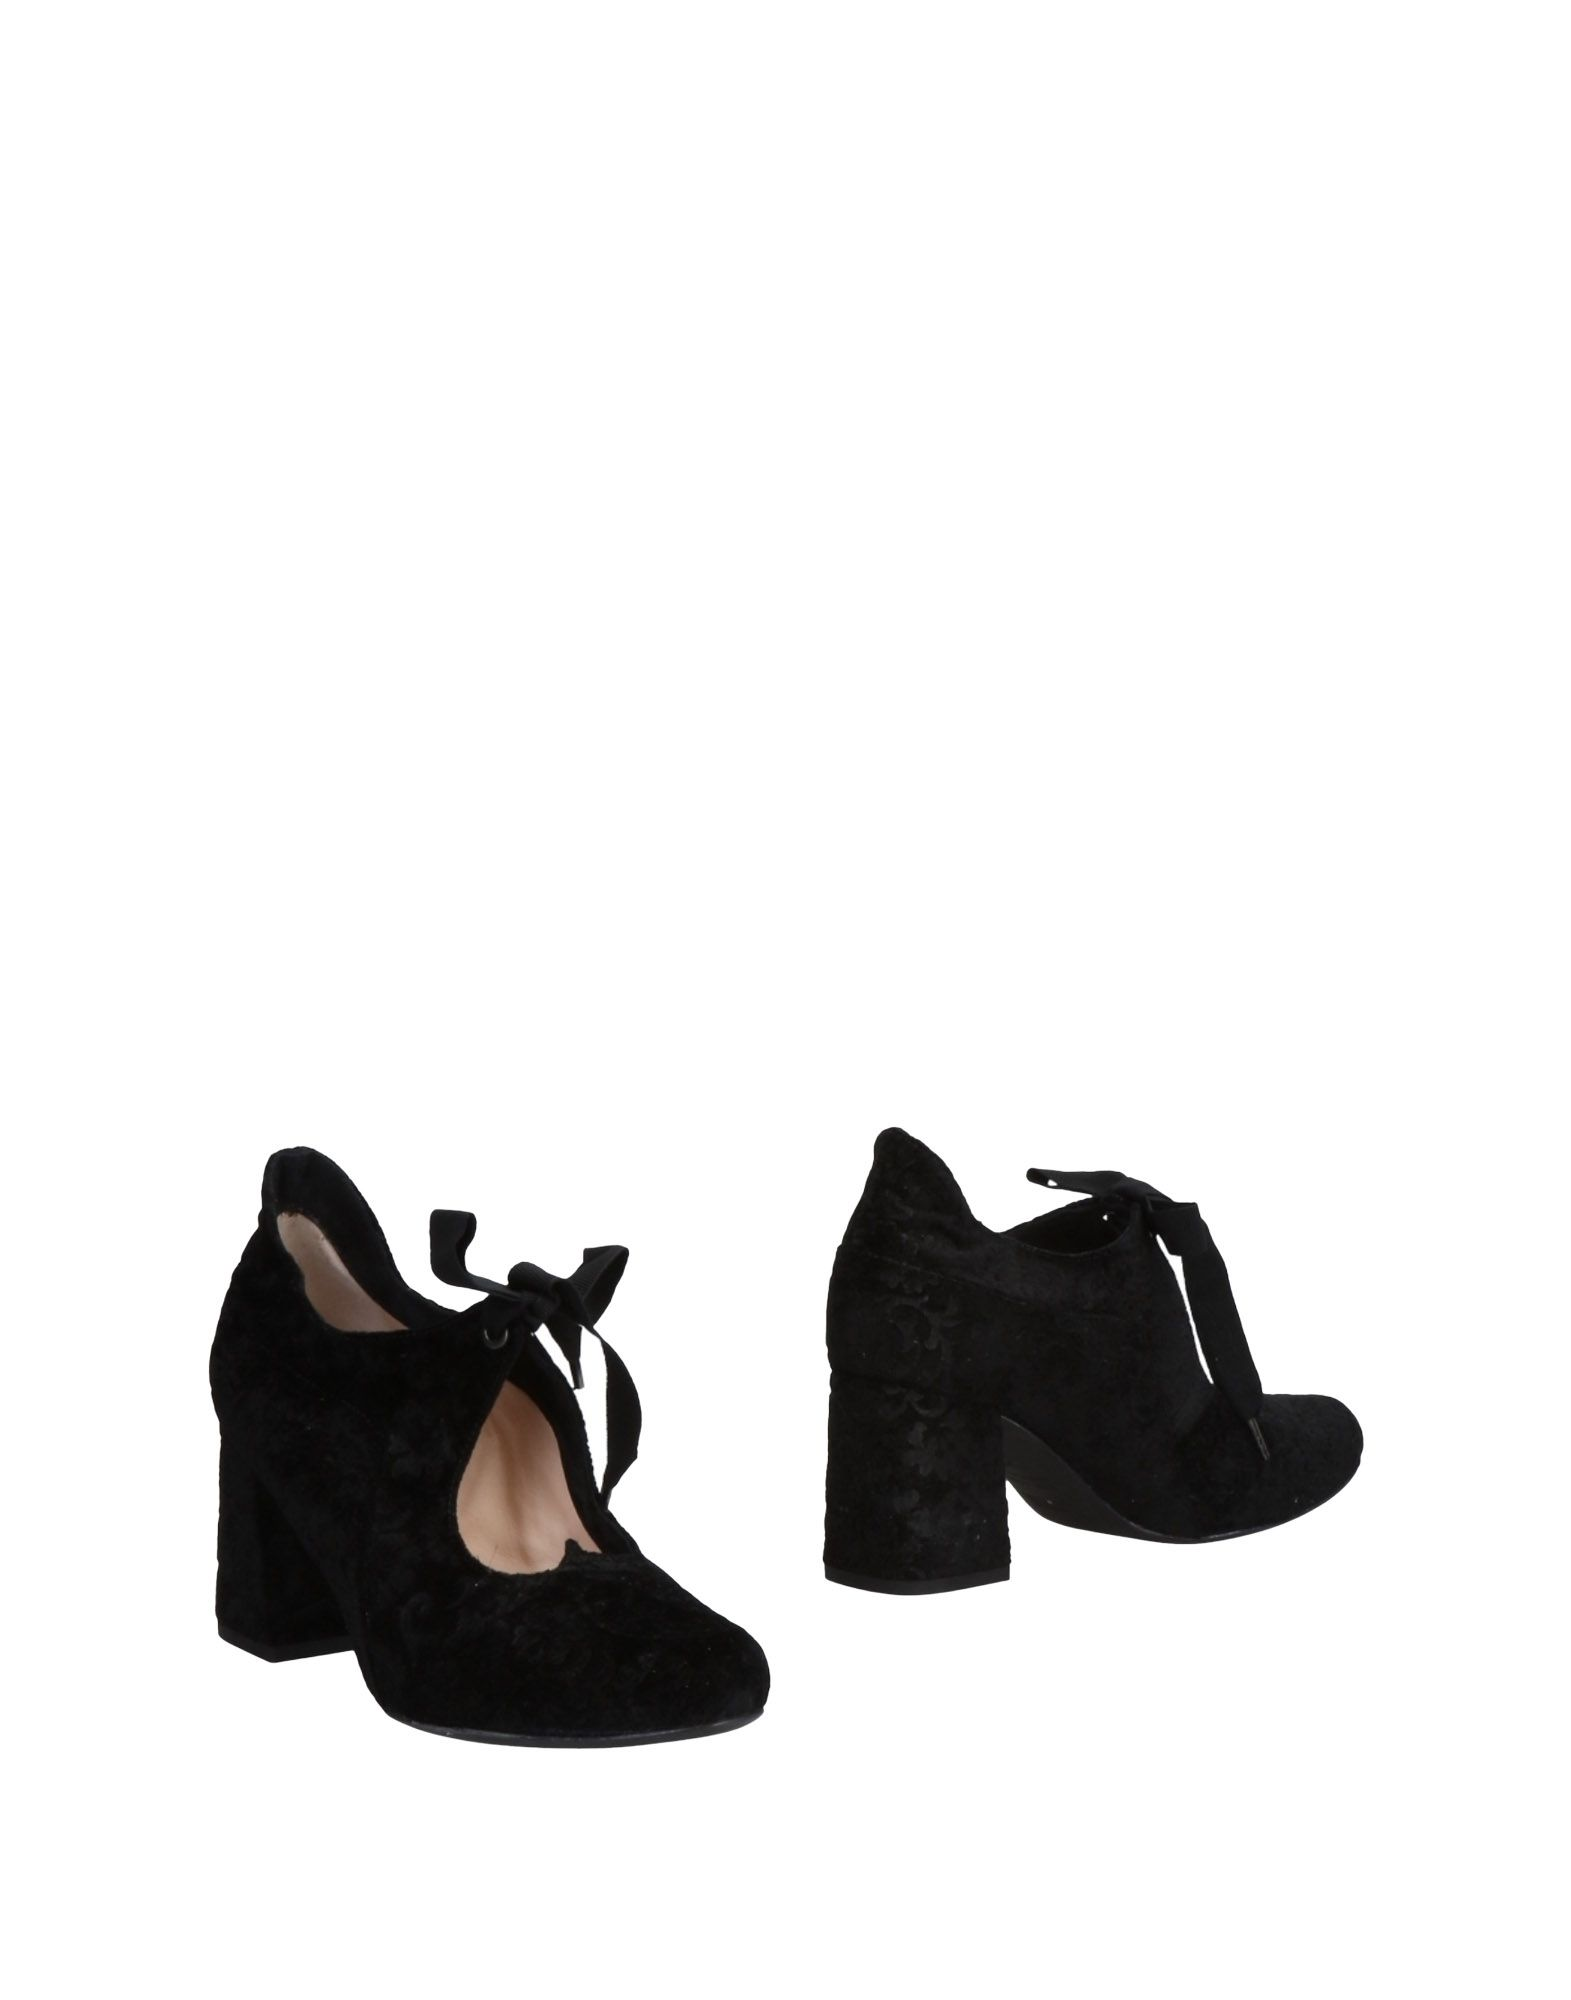 Mina Buenos Aires Stiefelette Damen Damen Damen  11468420UE Neue Schuhe f77383